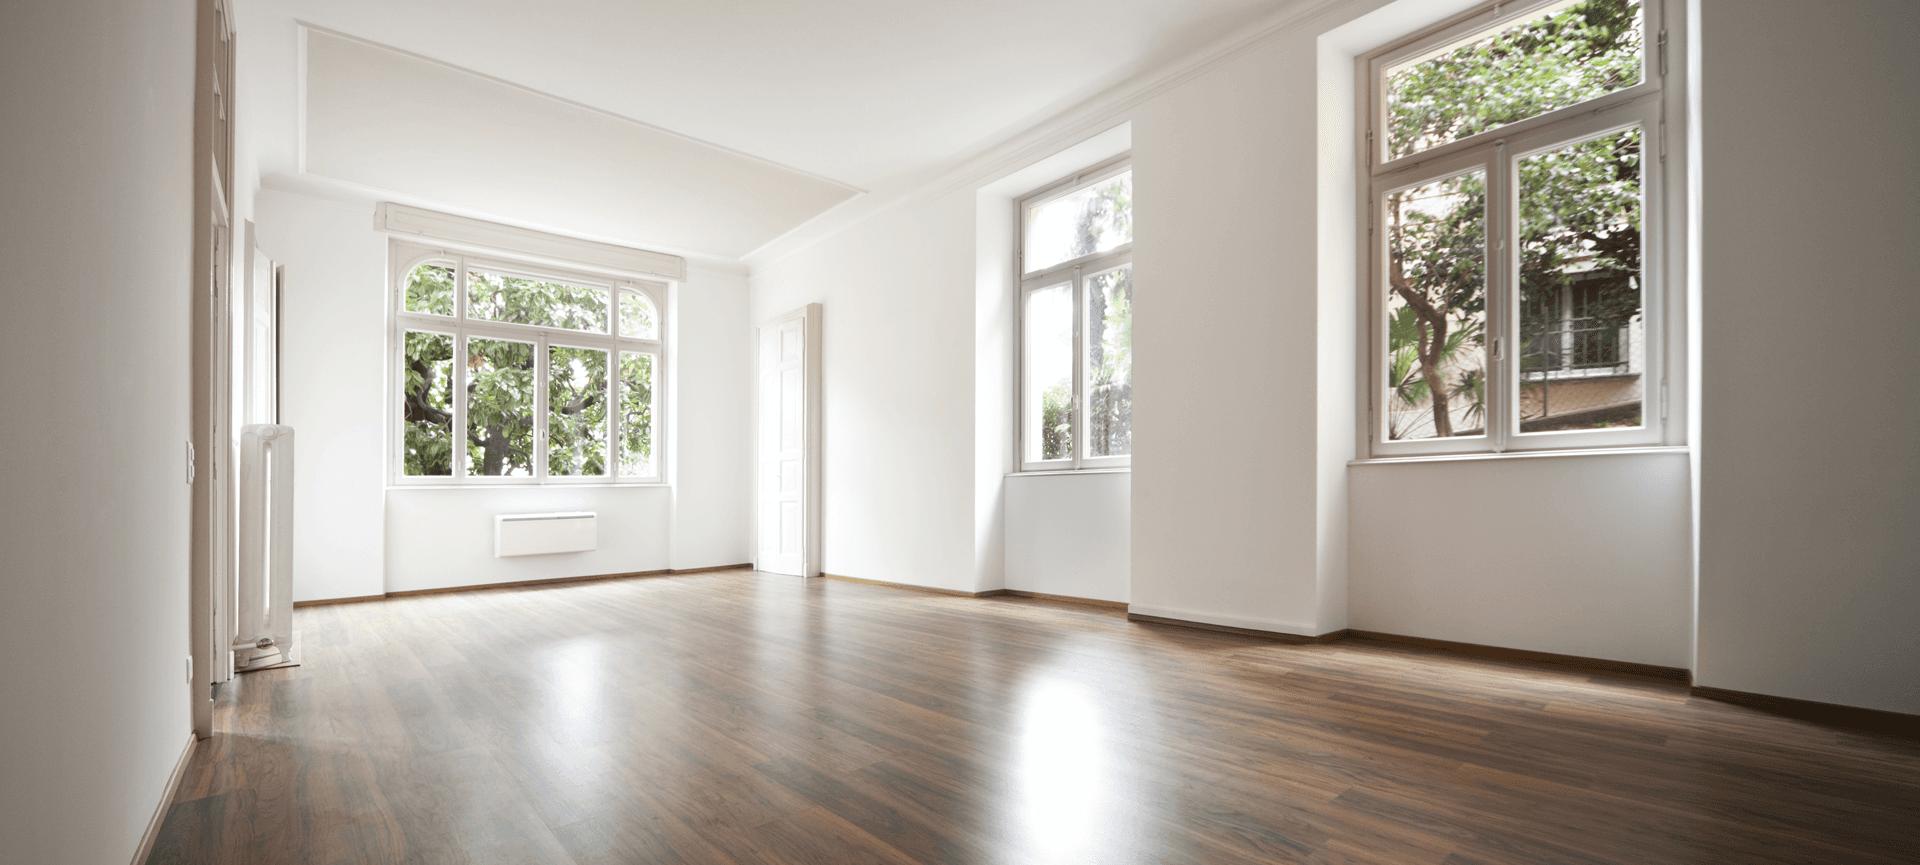 Thorough house clearances